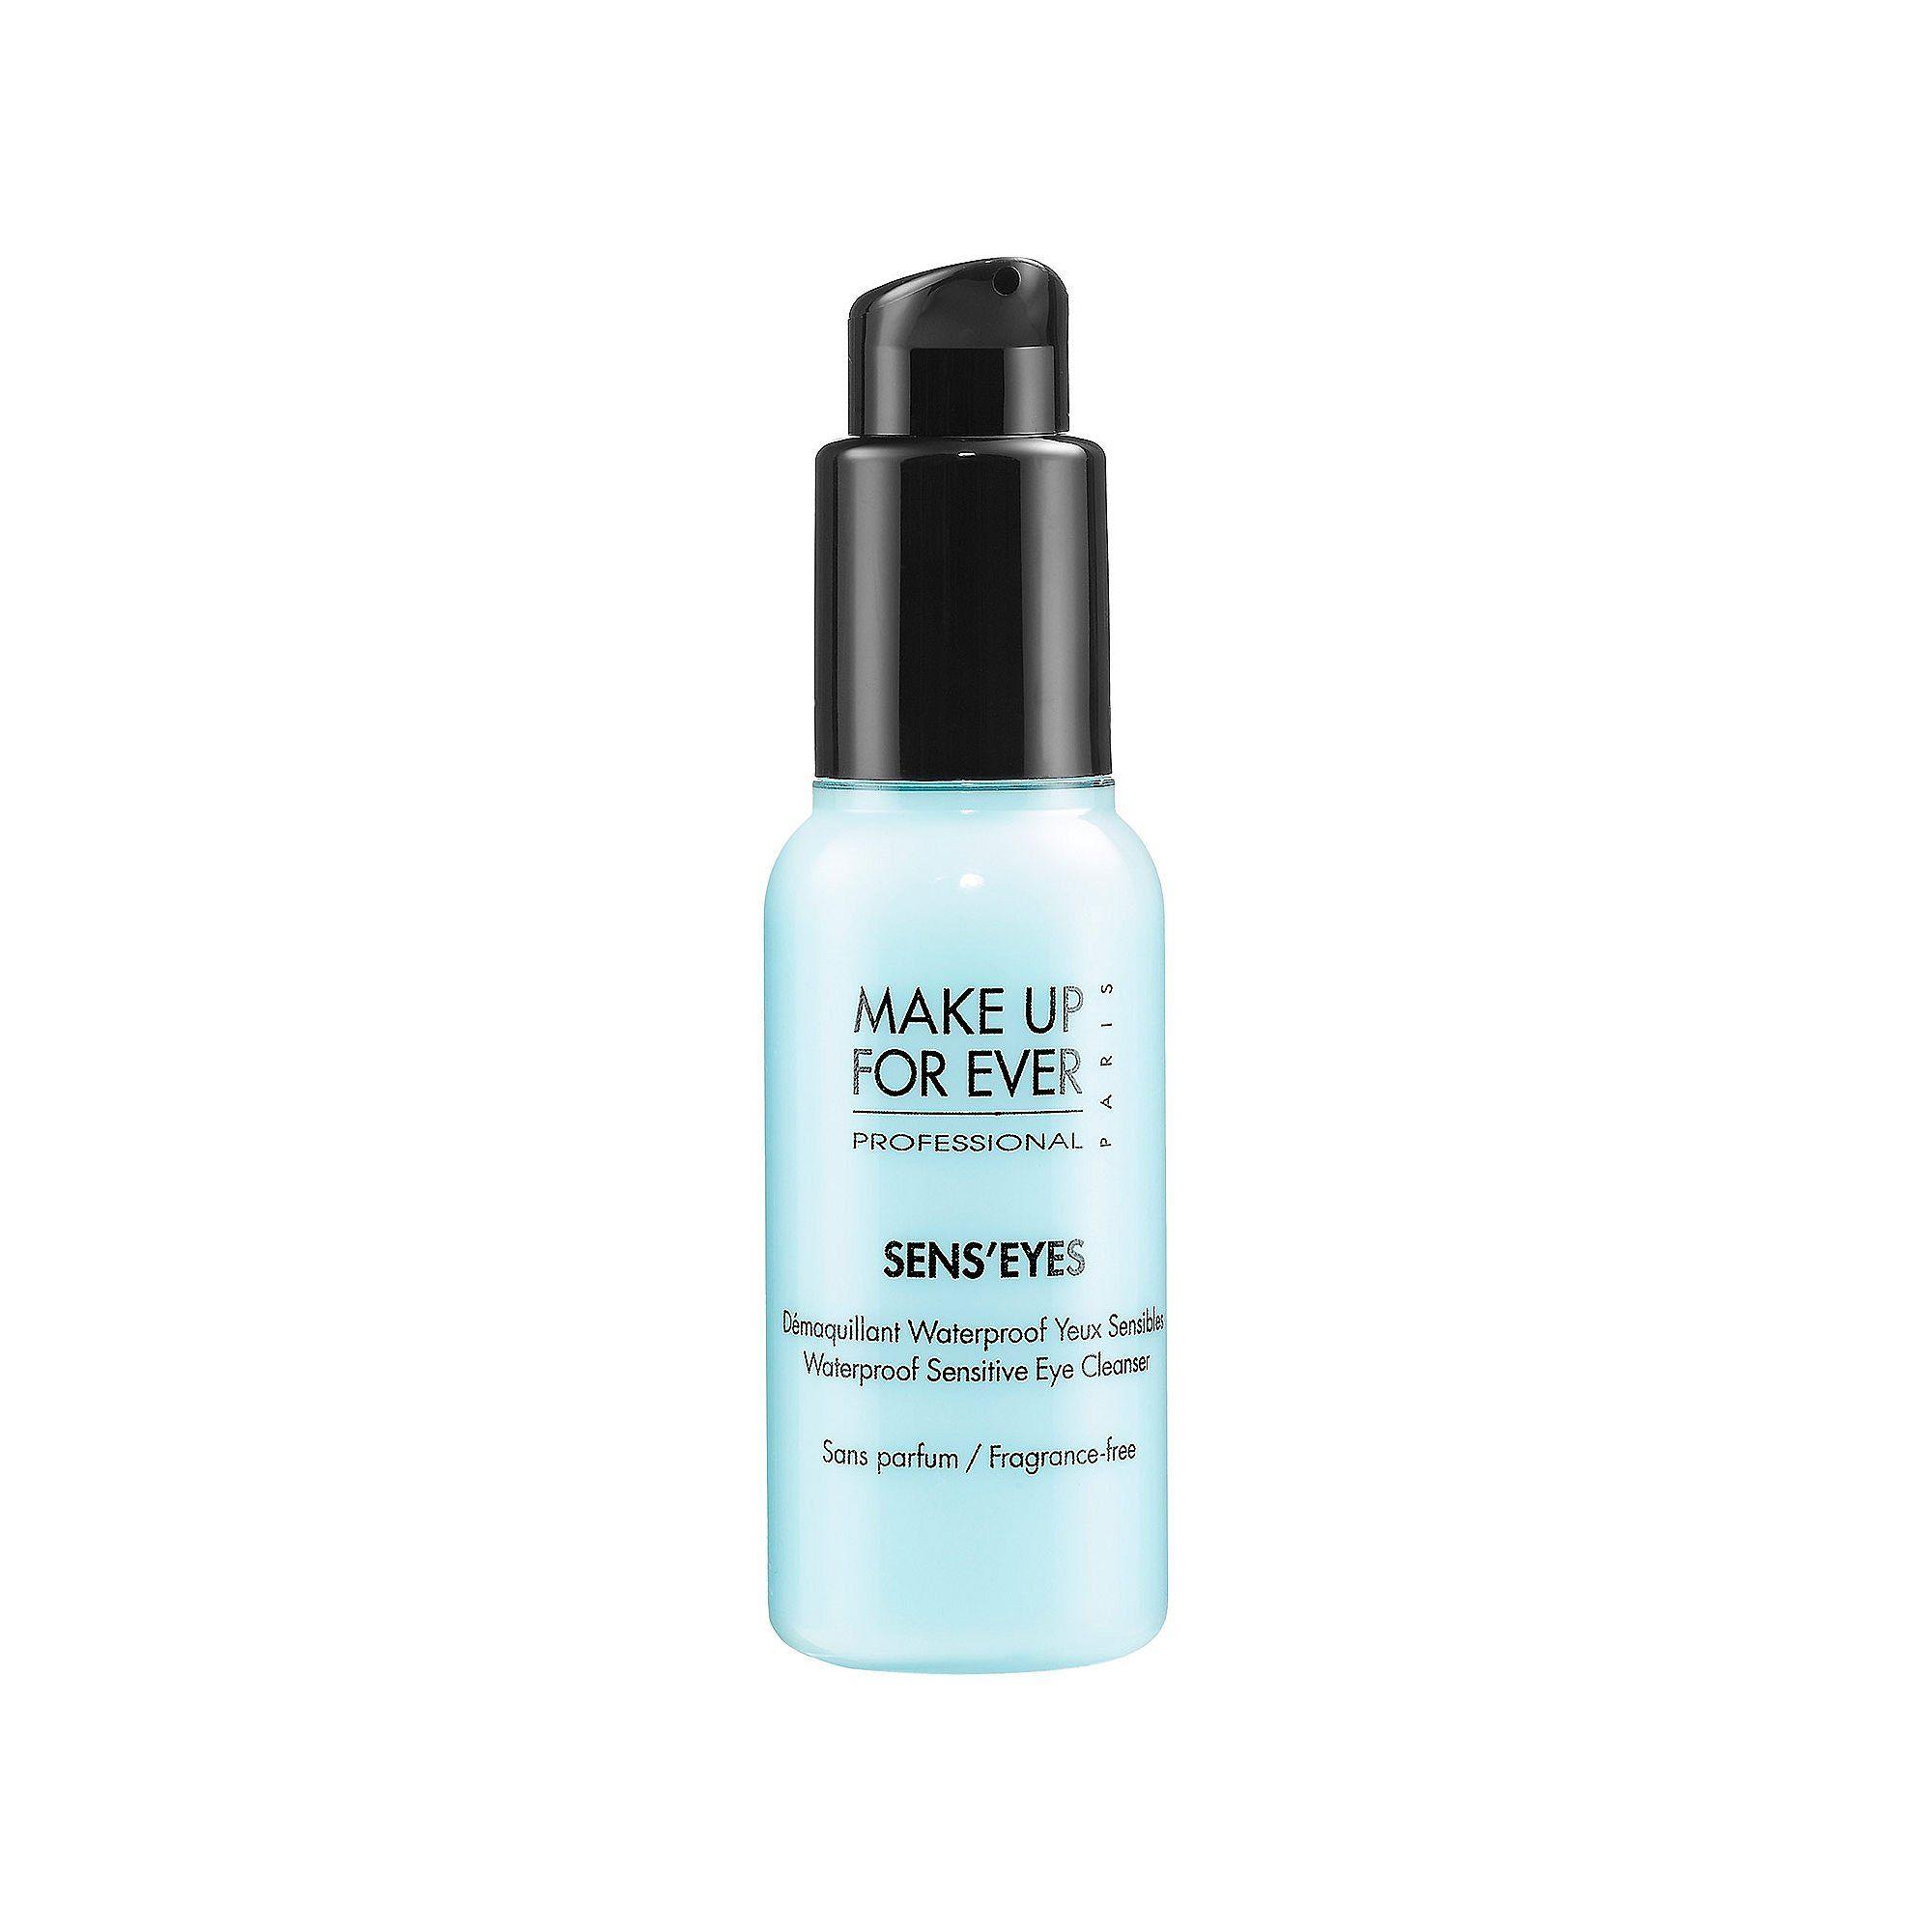 Make Up For Ever SensEyes Waterproof Sensitive Eye